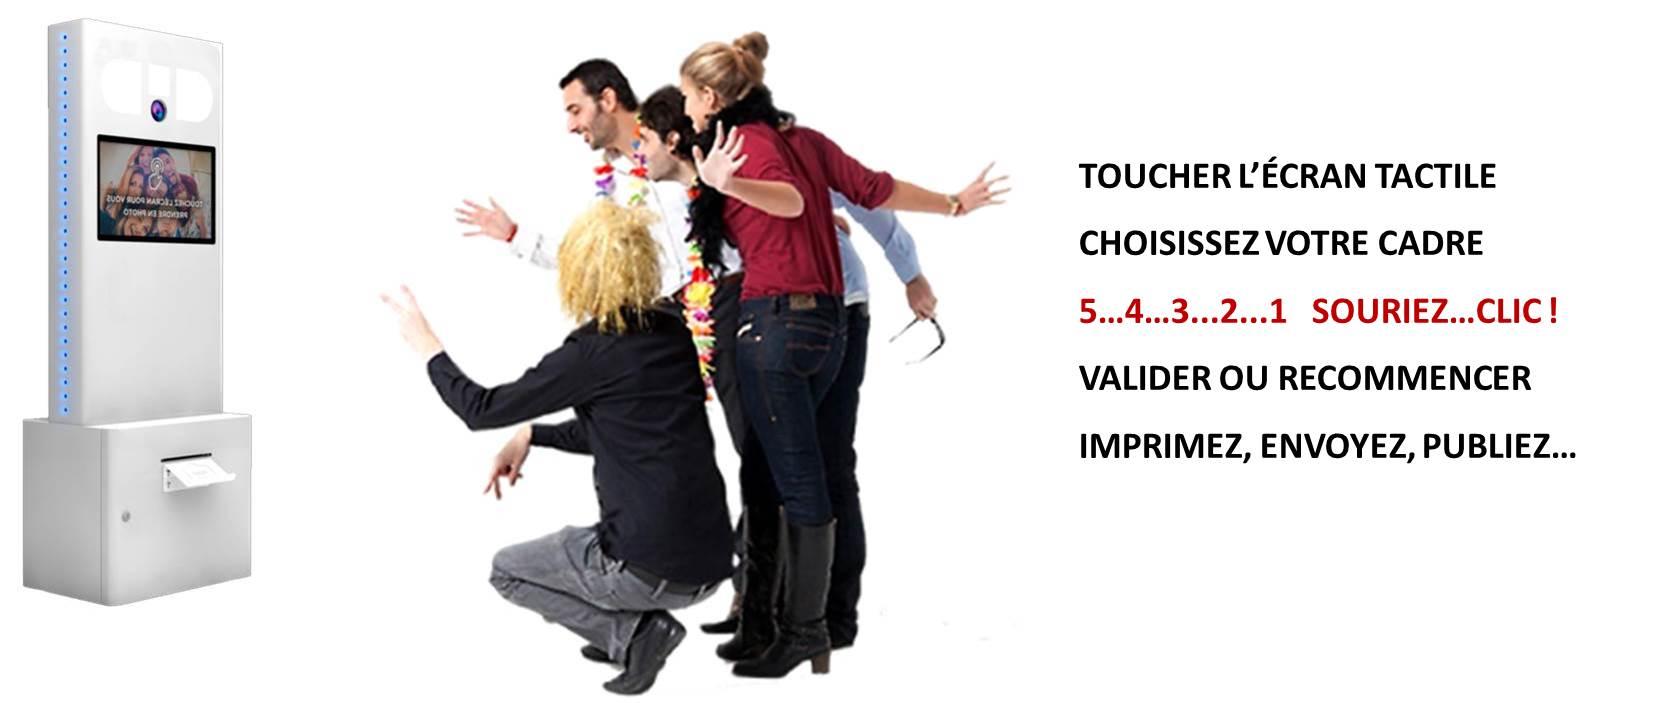 Image 1 page presentation